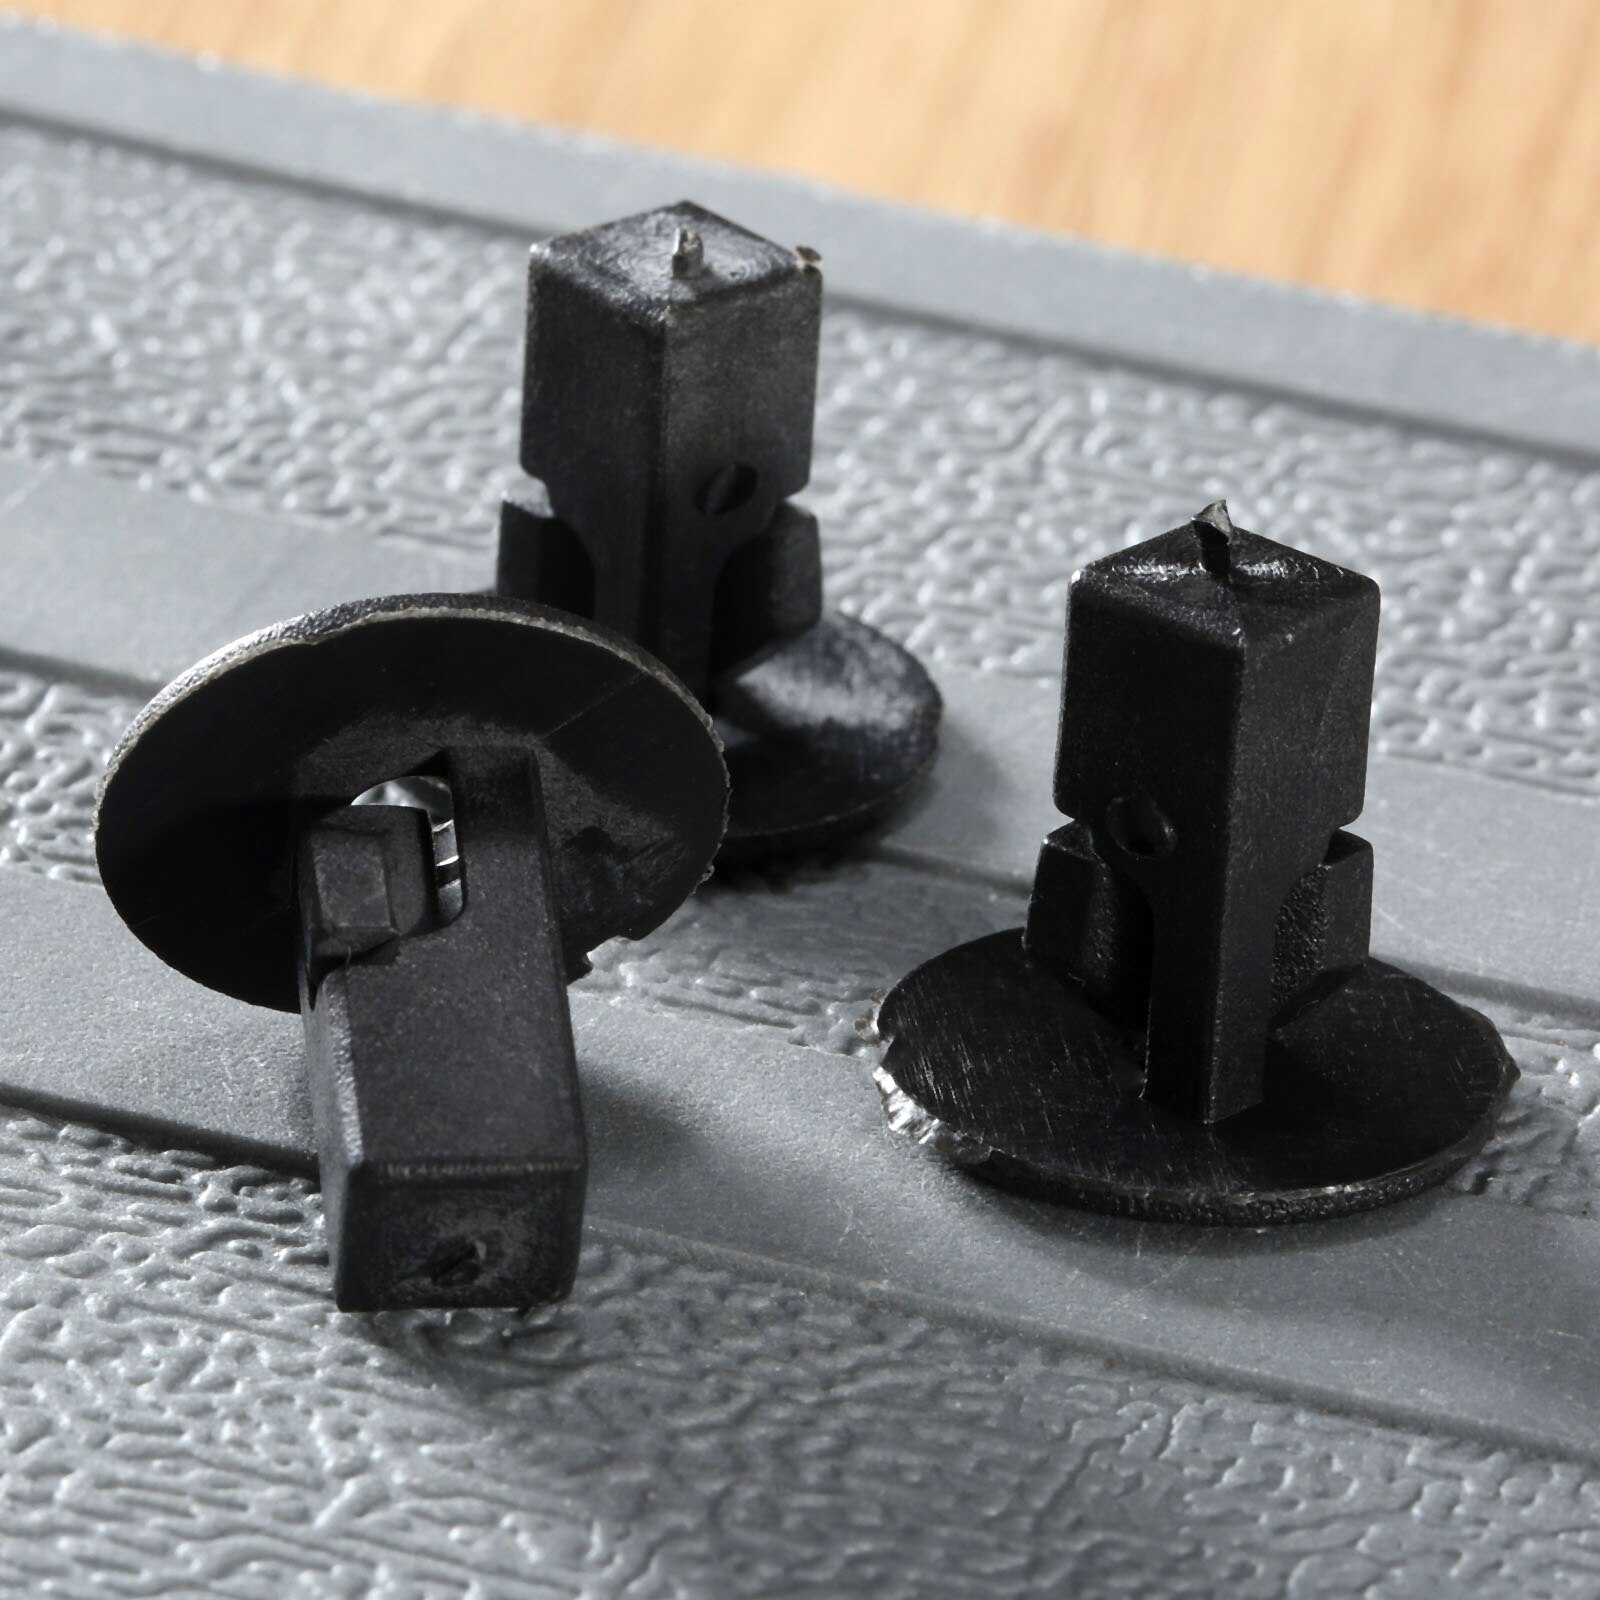 50 Uds Clips de sujeción para coche remaches guardabarros interiores 8,2x8,3mm agujero para Toyota retenedor Clips de ajuste parachoques Fender sujetadores de empuje